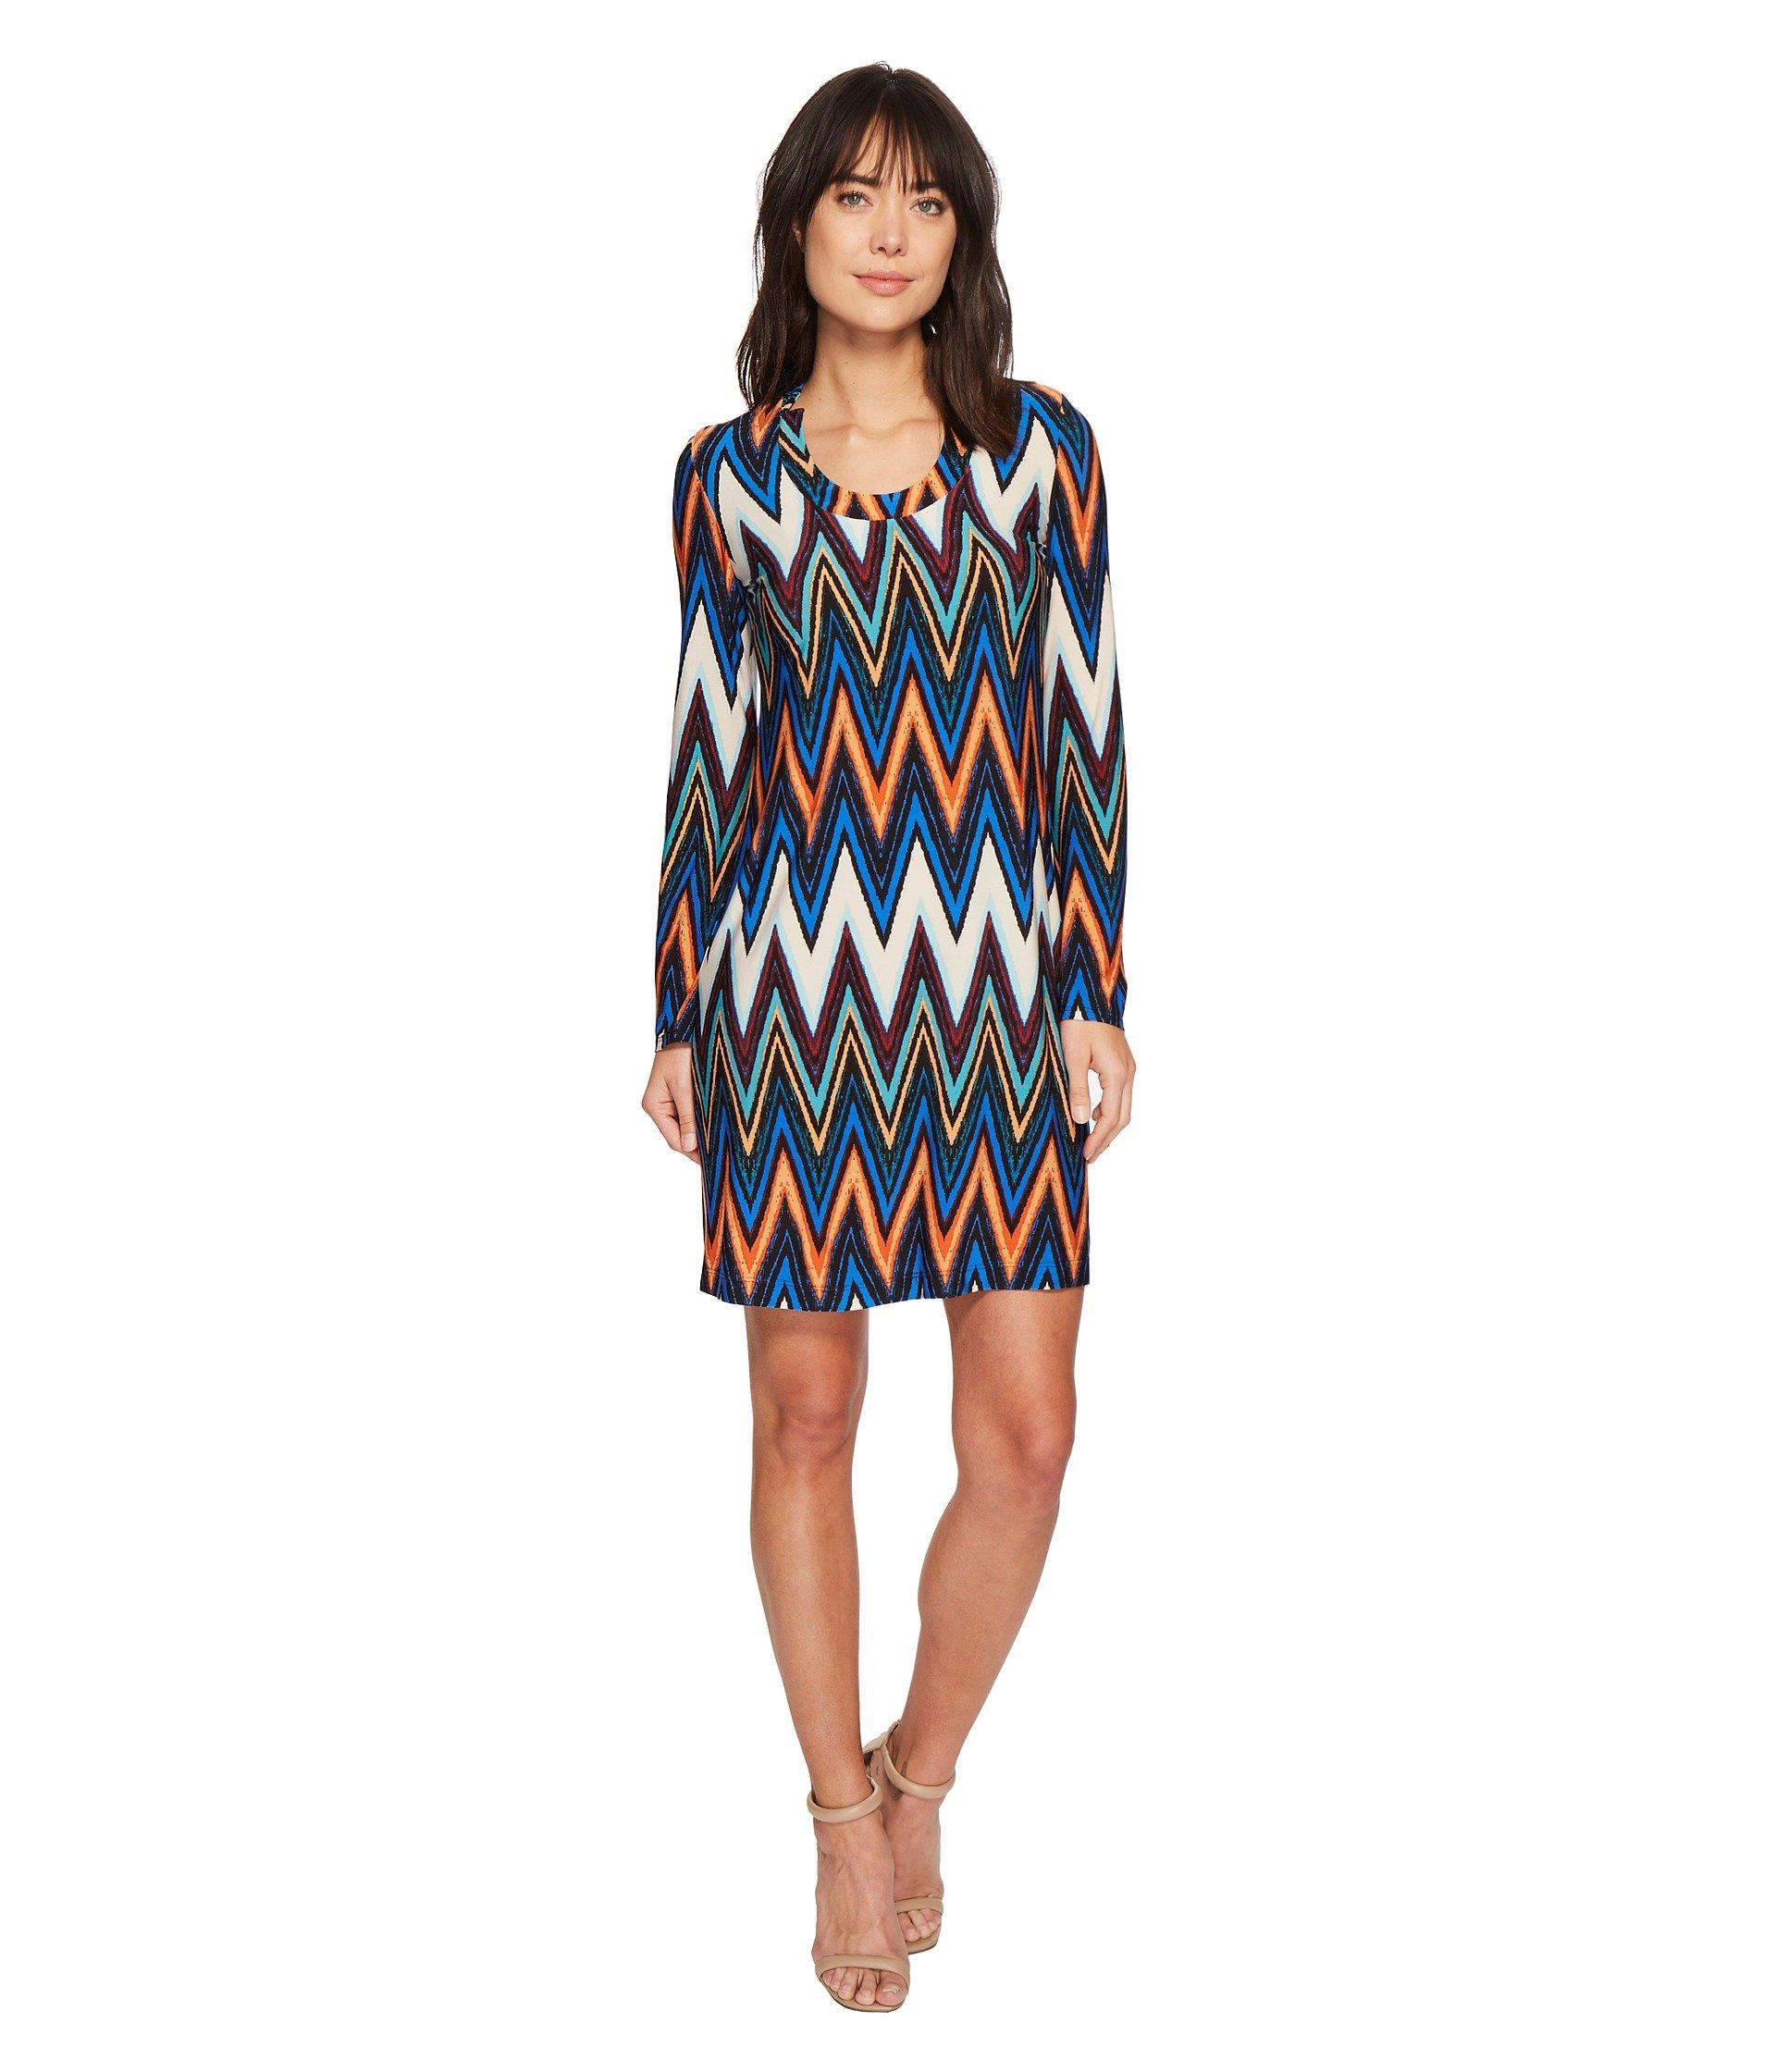 Chevron Printed Long Sleeve Scoop Neck Jersey Dress